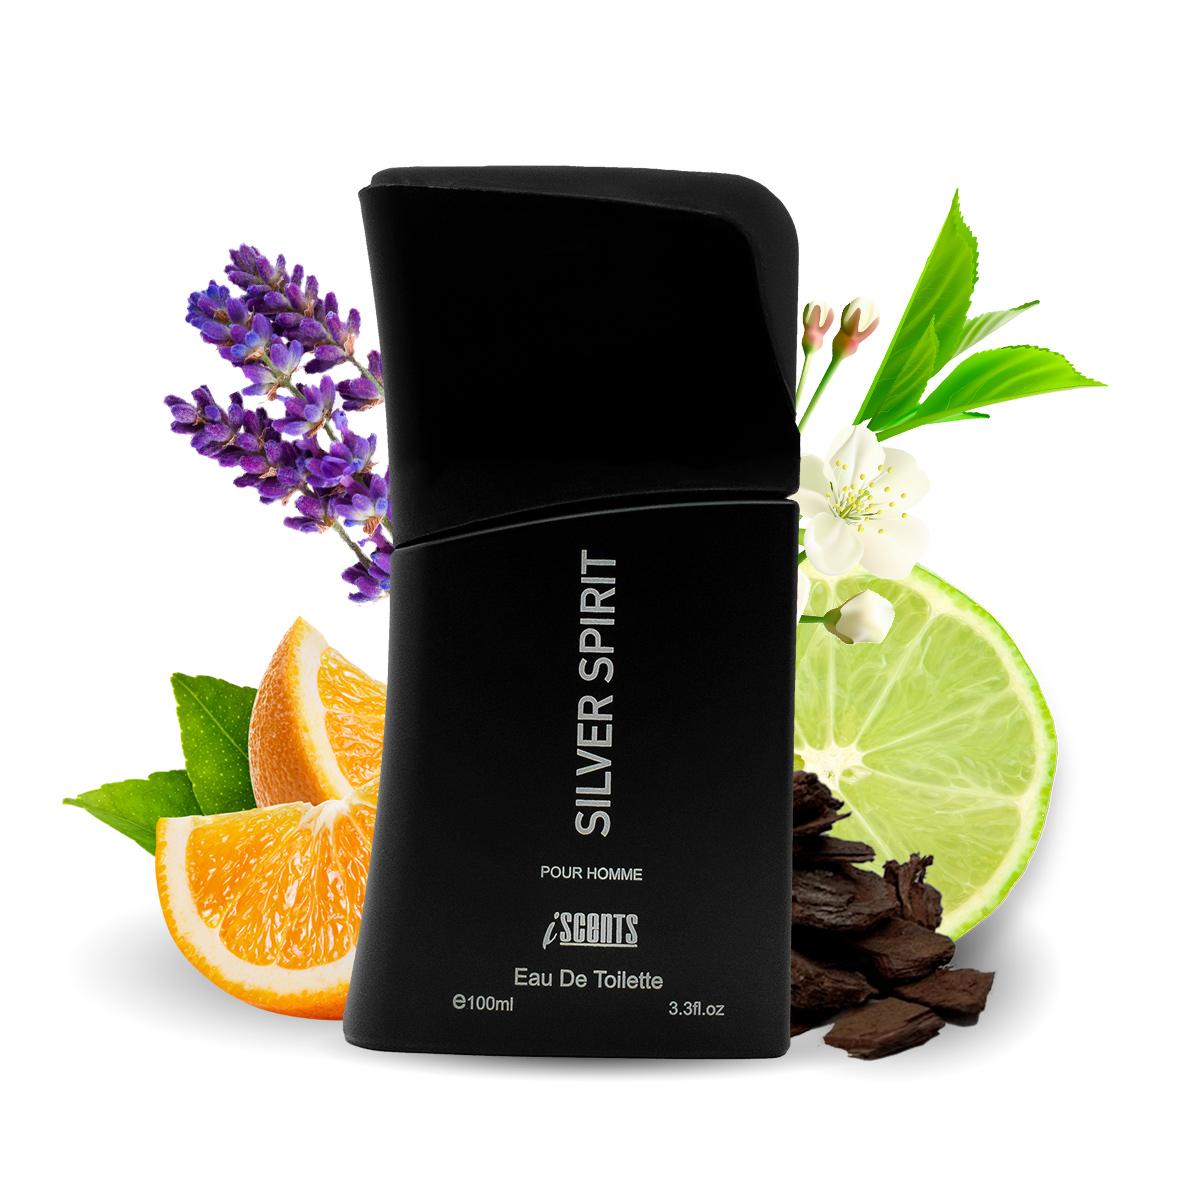 Kit 2 Perfumes Importados Buzz e Silver Spirit I Scents